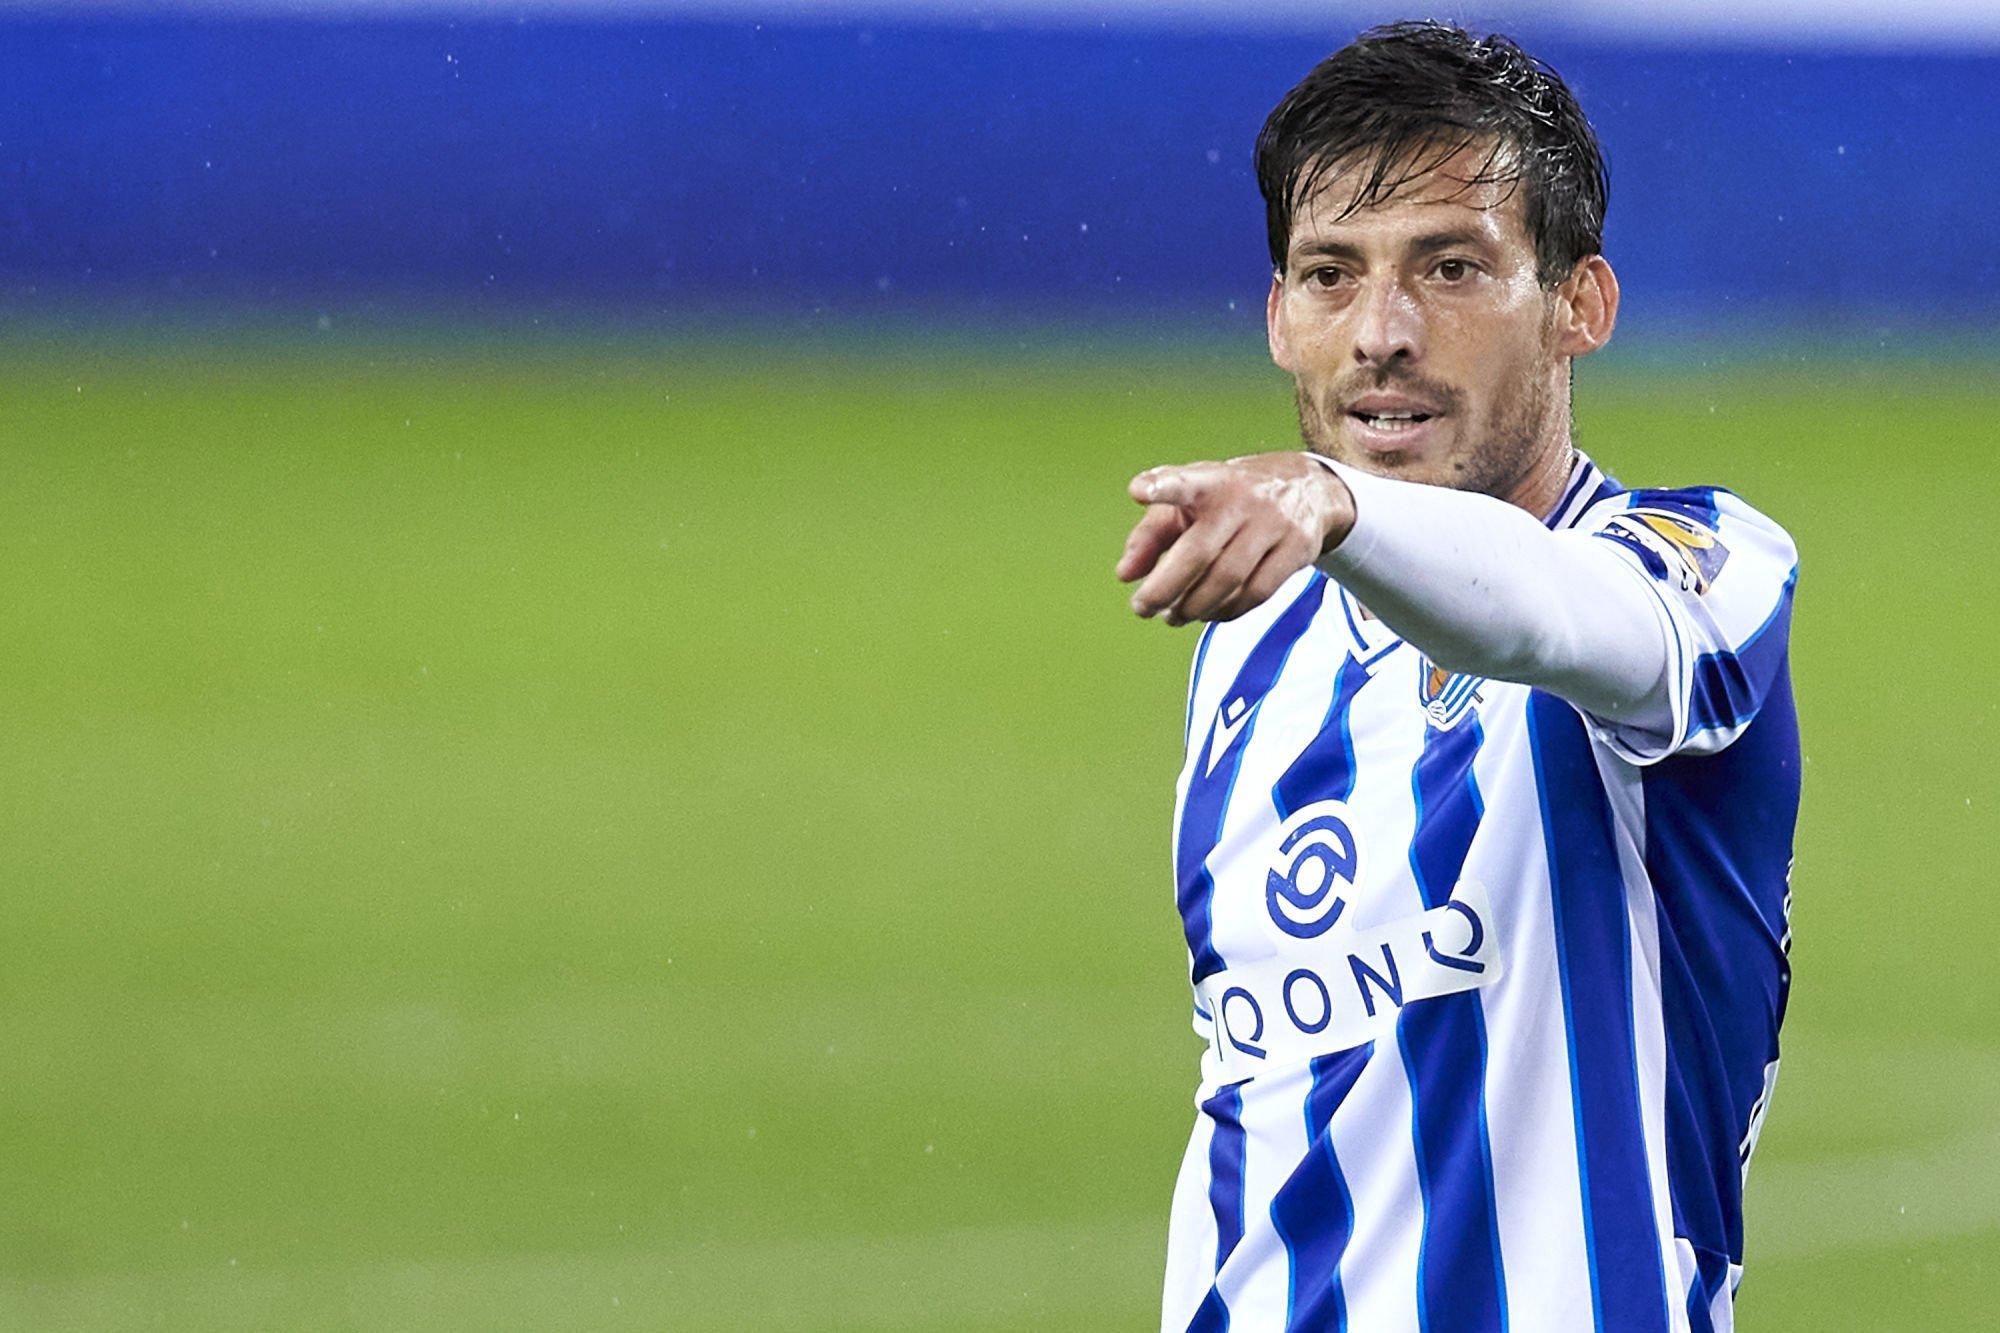 Real Sociedad's talisman David Silva